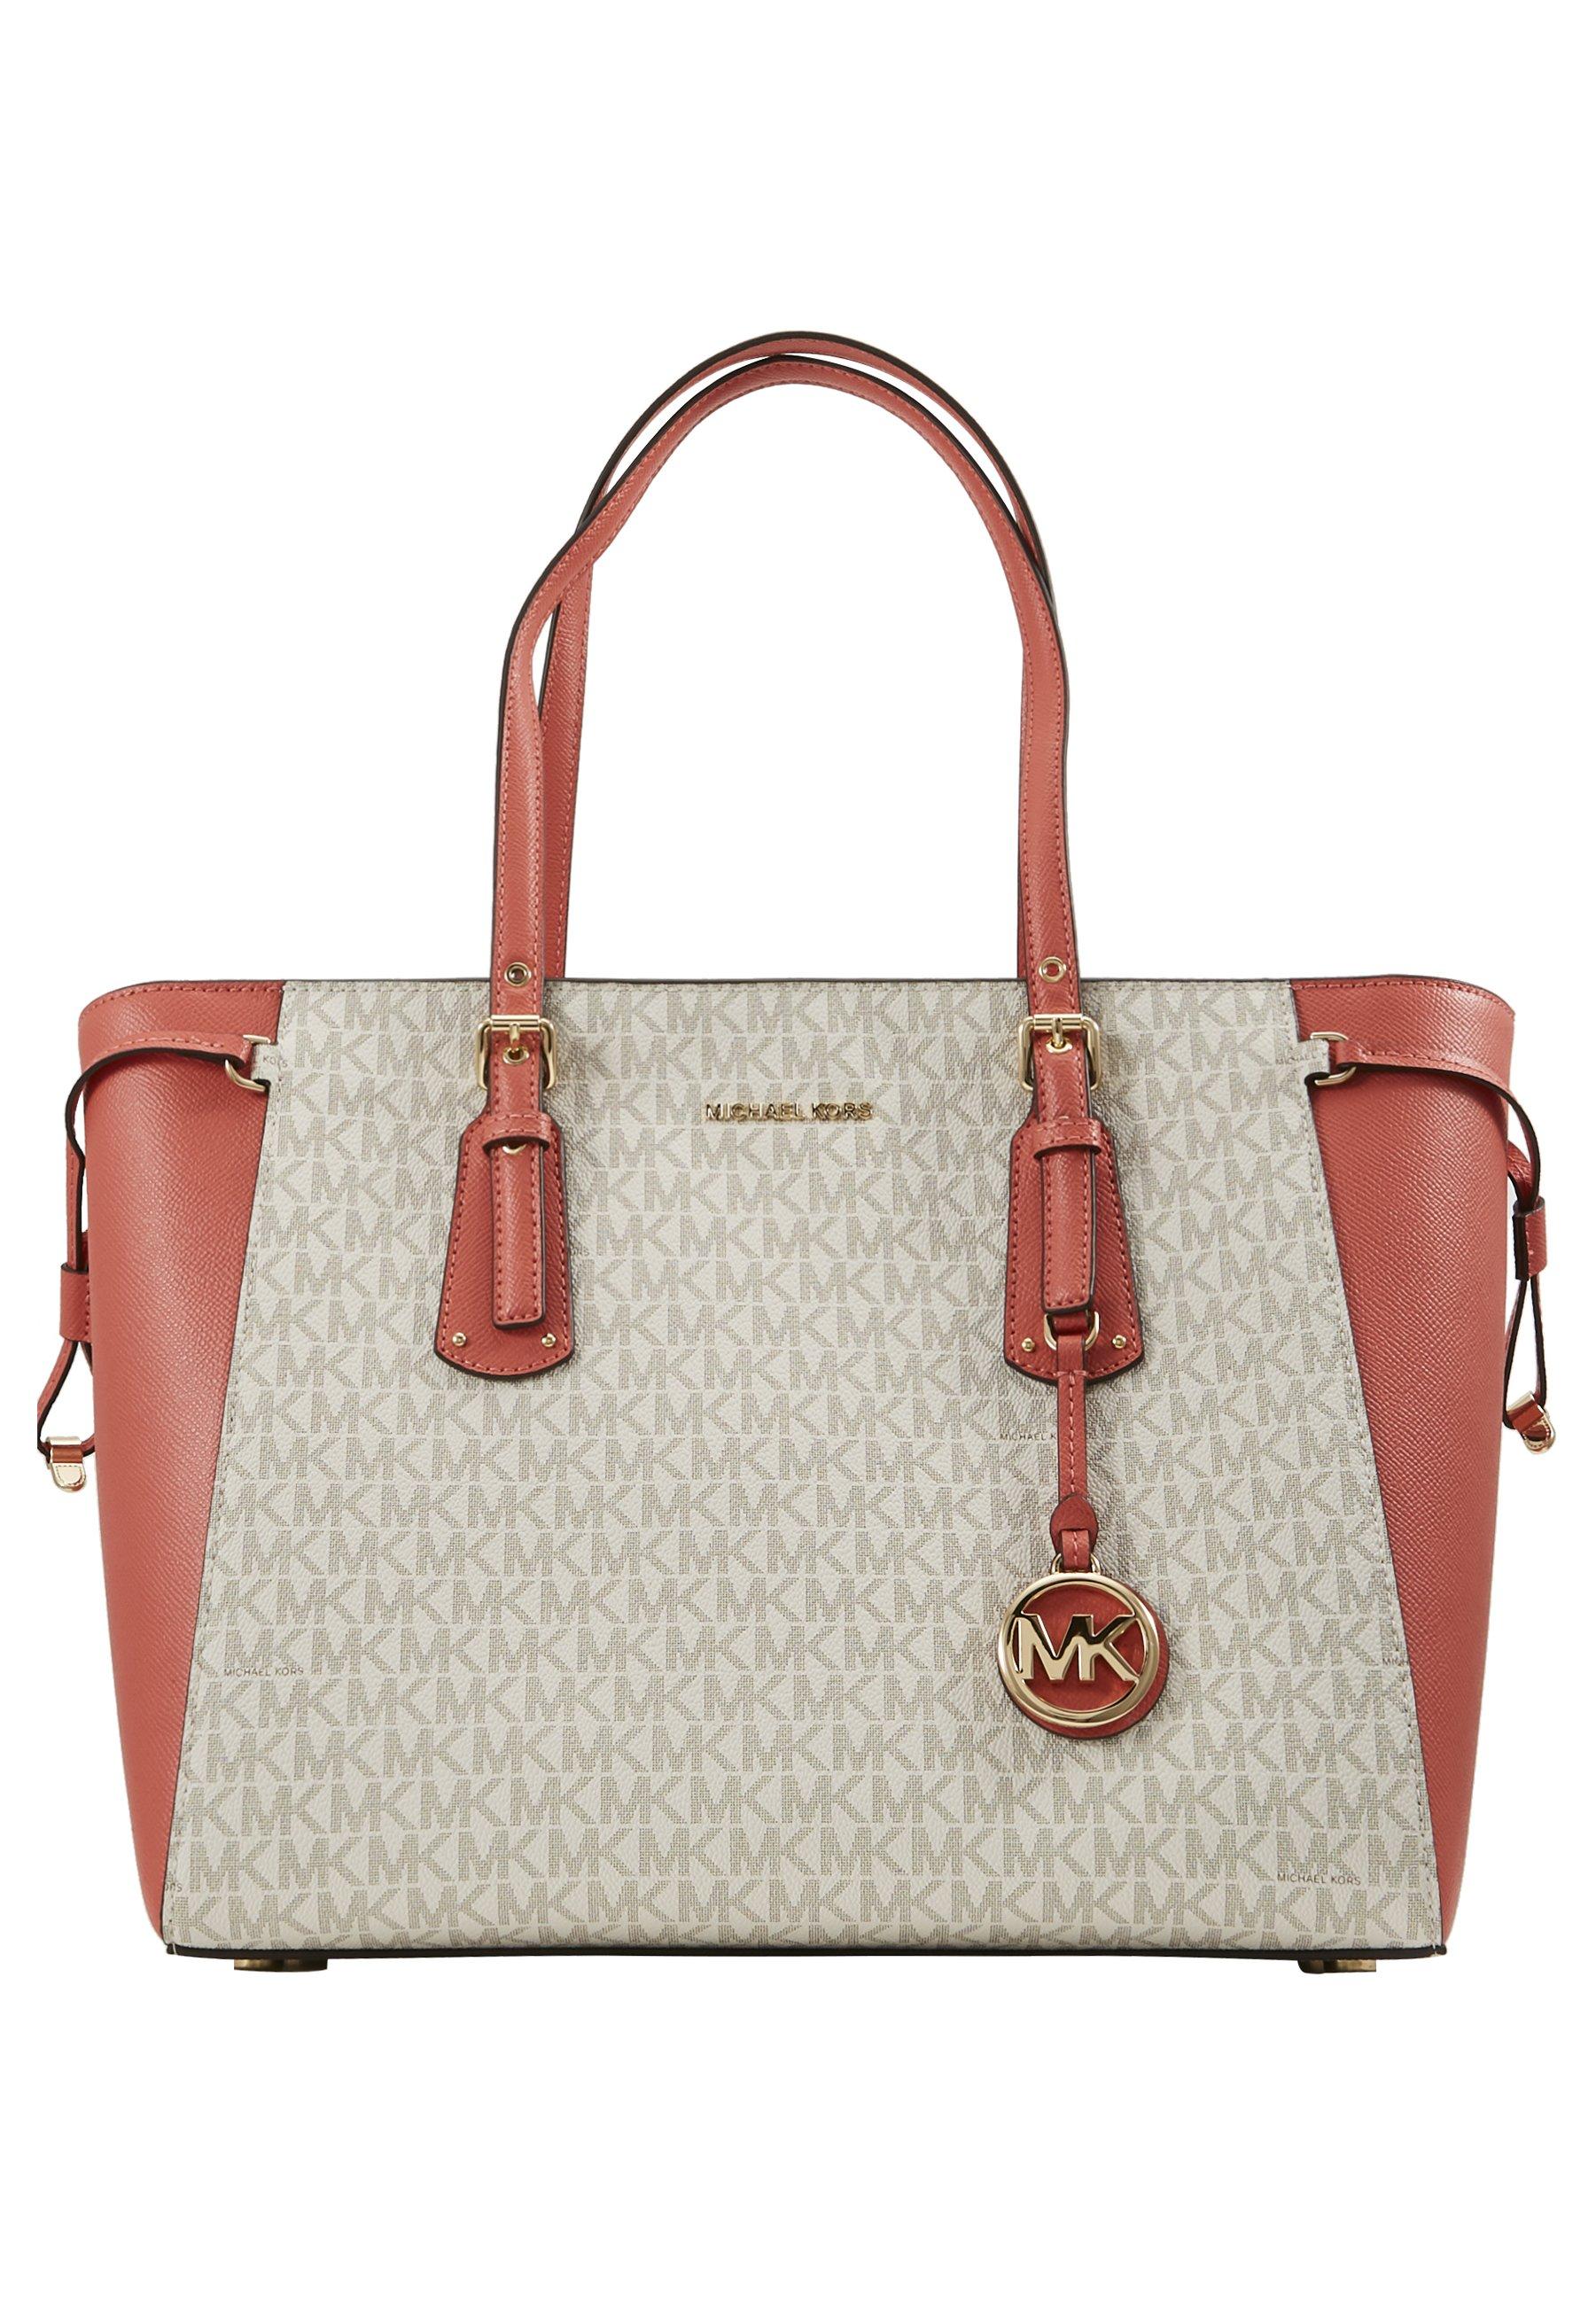 Michael Kors Voyager Tote - Shopping Bag Pink Grapfruit ZH3taaX